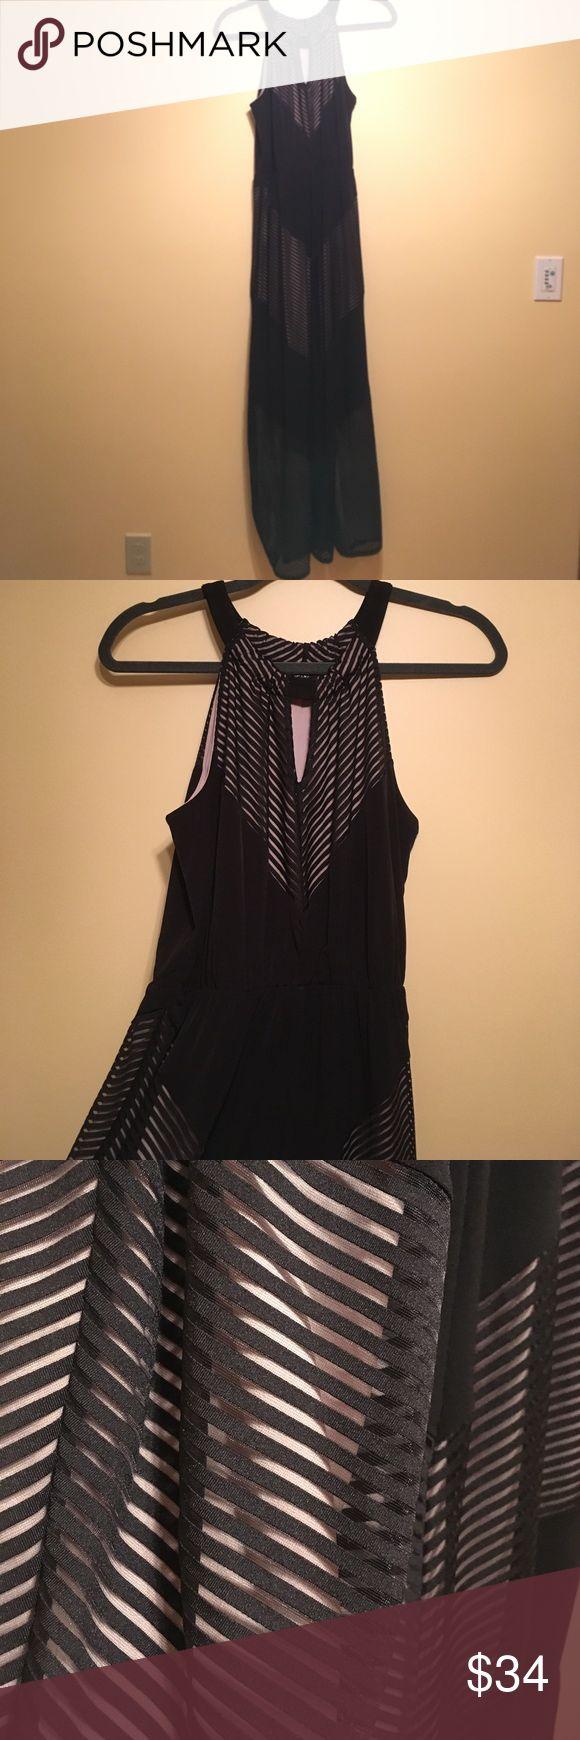 Chevron black and tan Apt. 9 maxi dress! Chevron black and tan Apt. 9 maxi dress! Fully lined worn once. Incredibly flattering. Apt. 9 Dresses Maxi